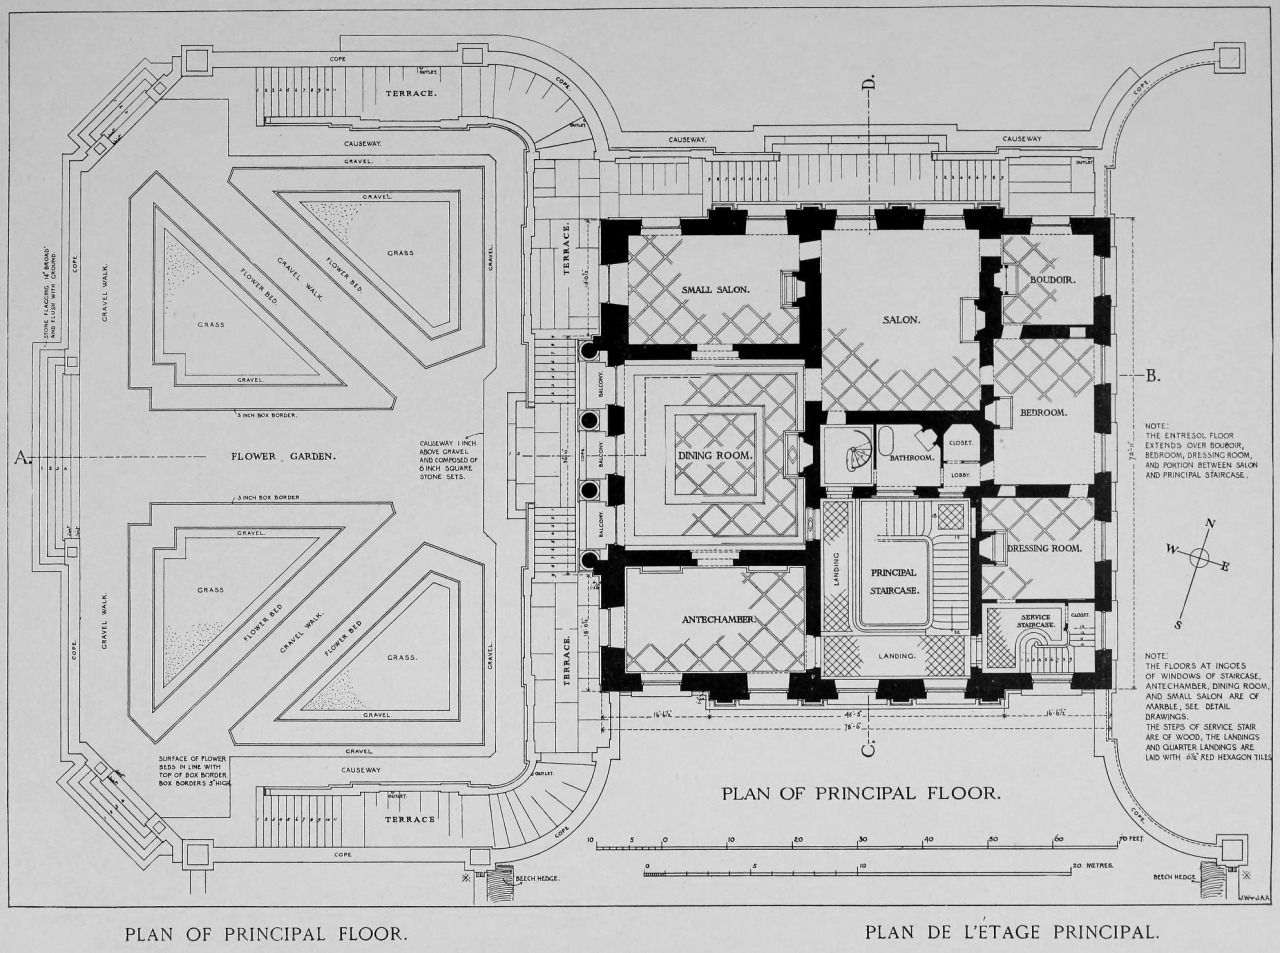 Plan of the main floor of the petit trianon versailles - Architektur plan ...